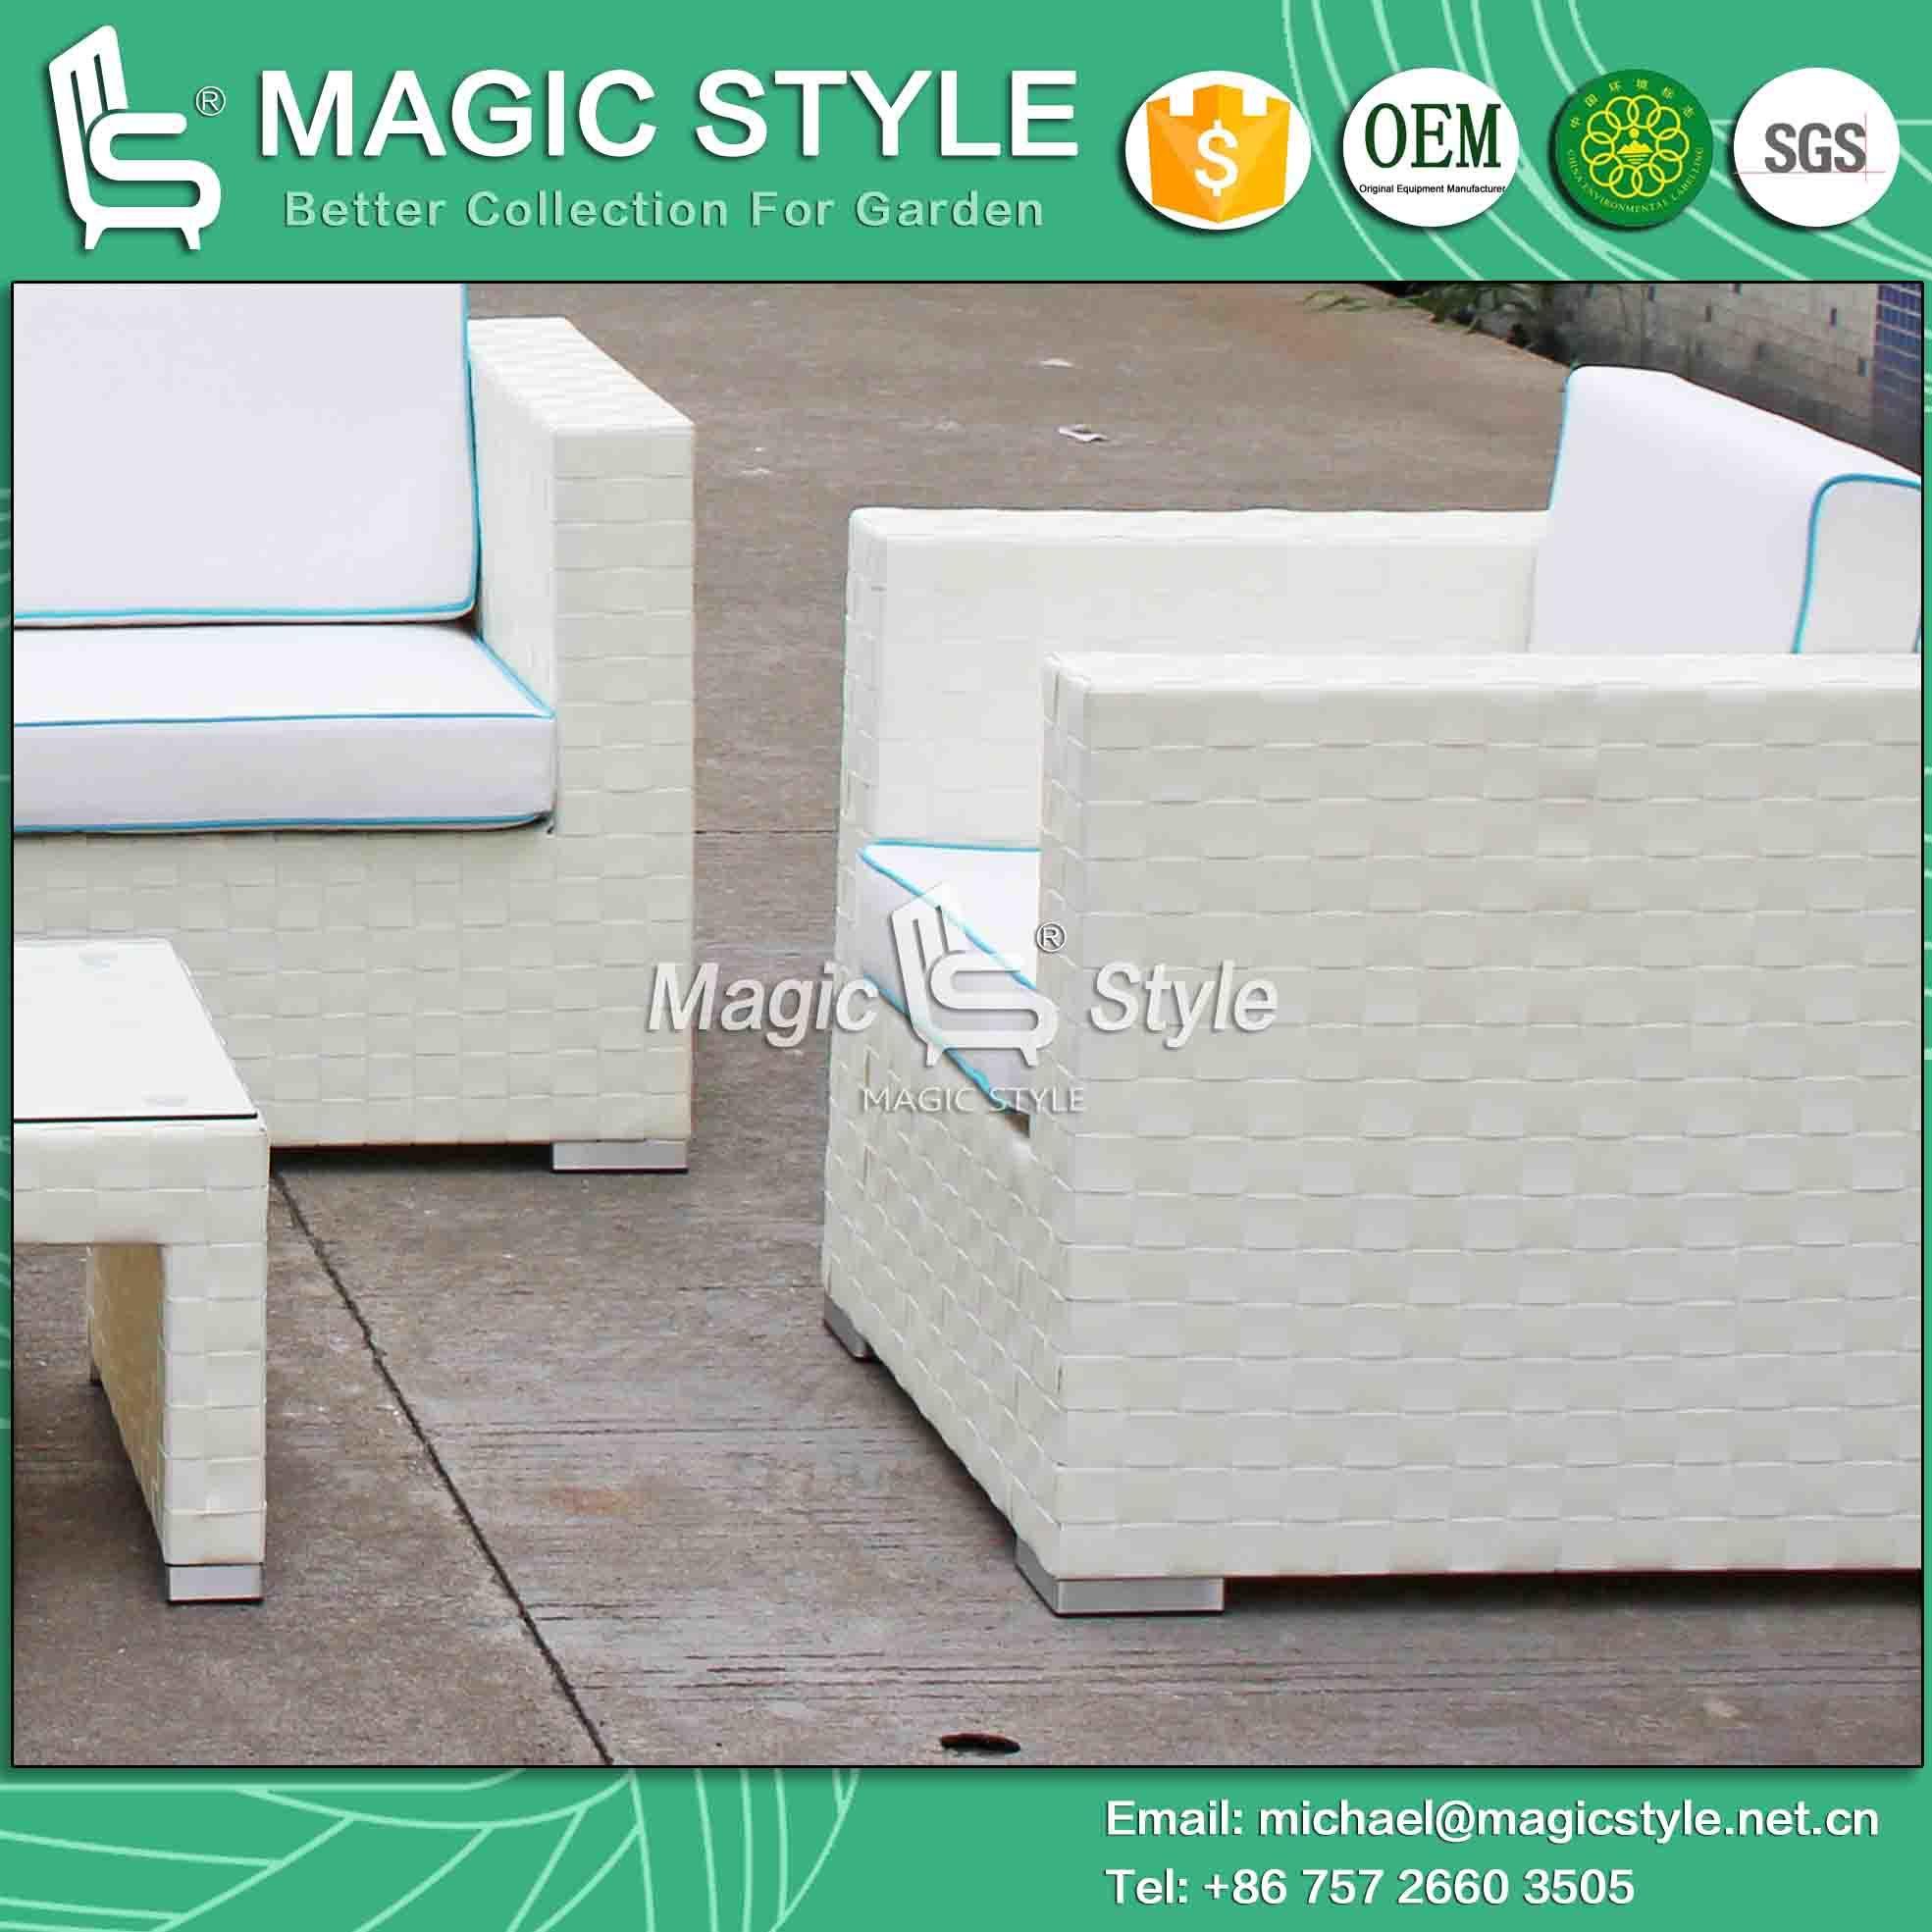 Rattan Sofa Combination Sofa Set Outdoor Furniture Sofa Set Patio Sofa Garden Sofa Leisure Sofa